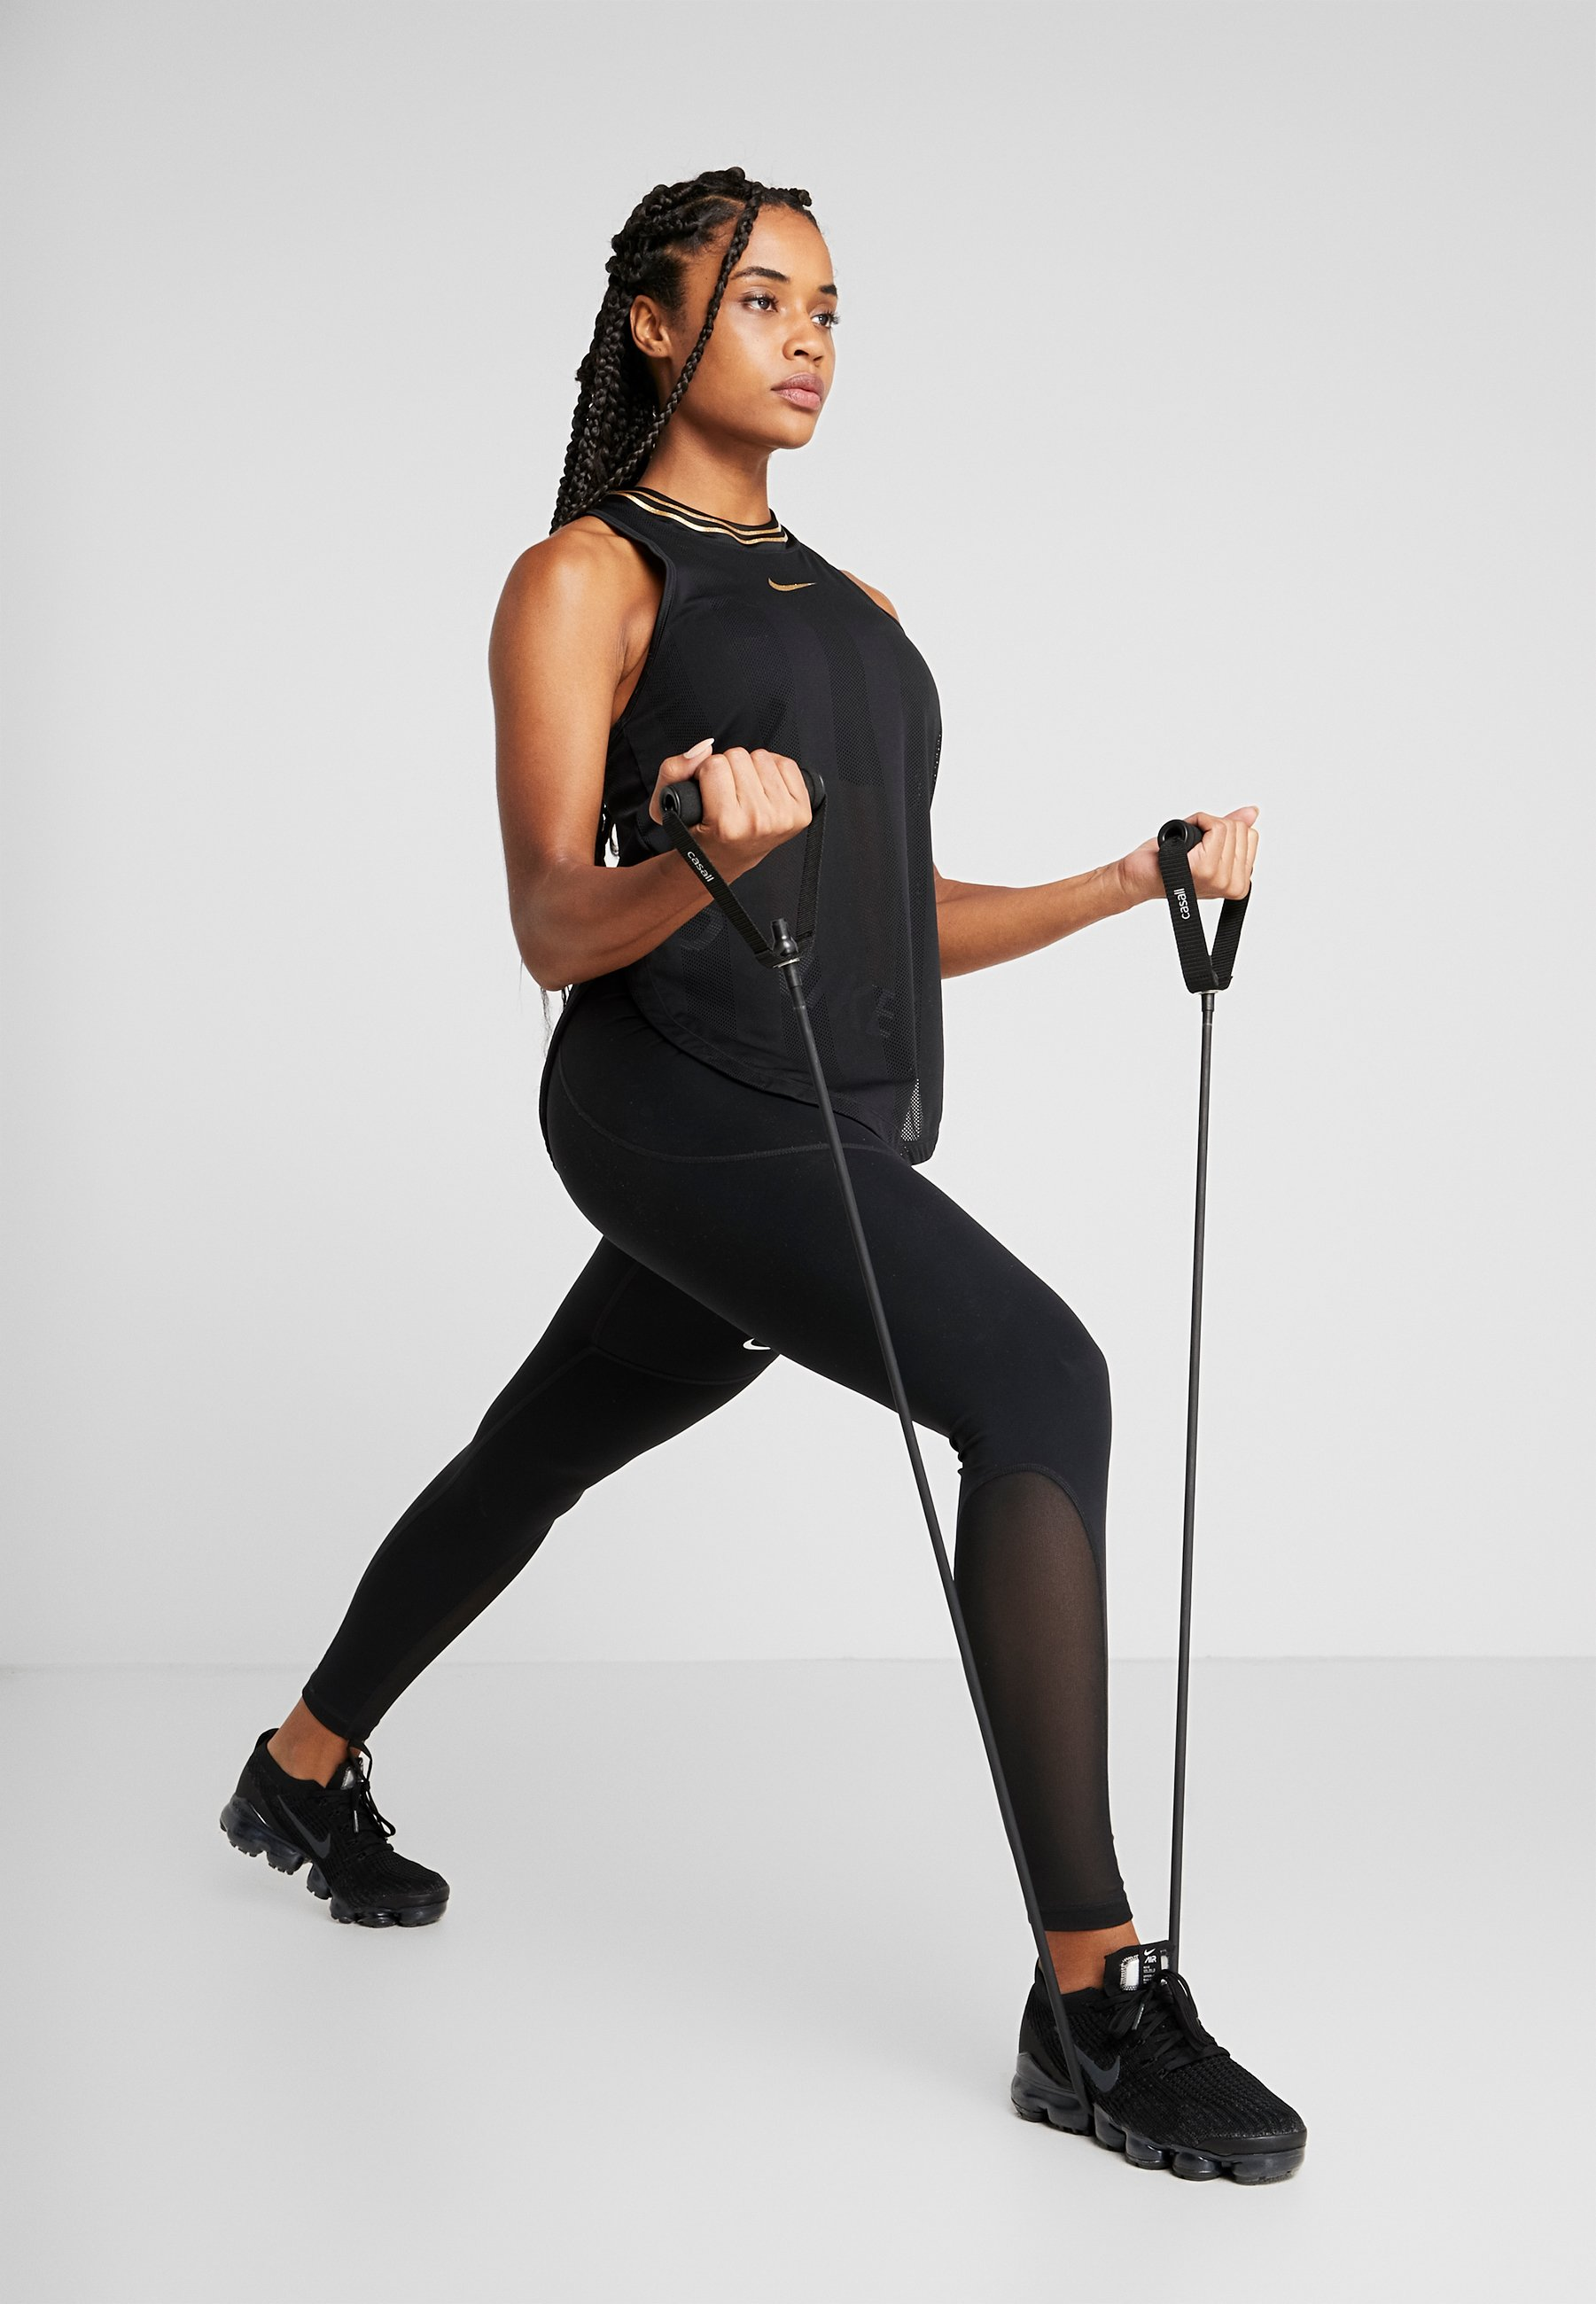 Femme EXETUBE MEDIUM - Equipement de fitness et yoga